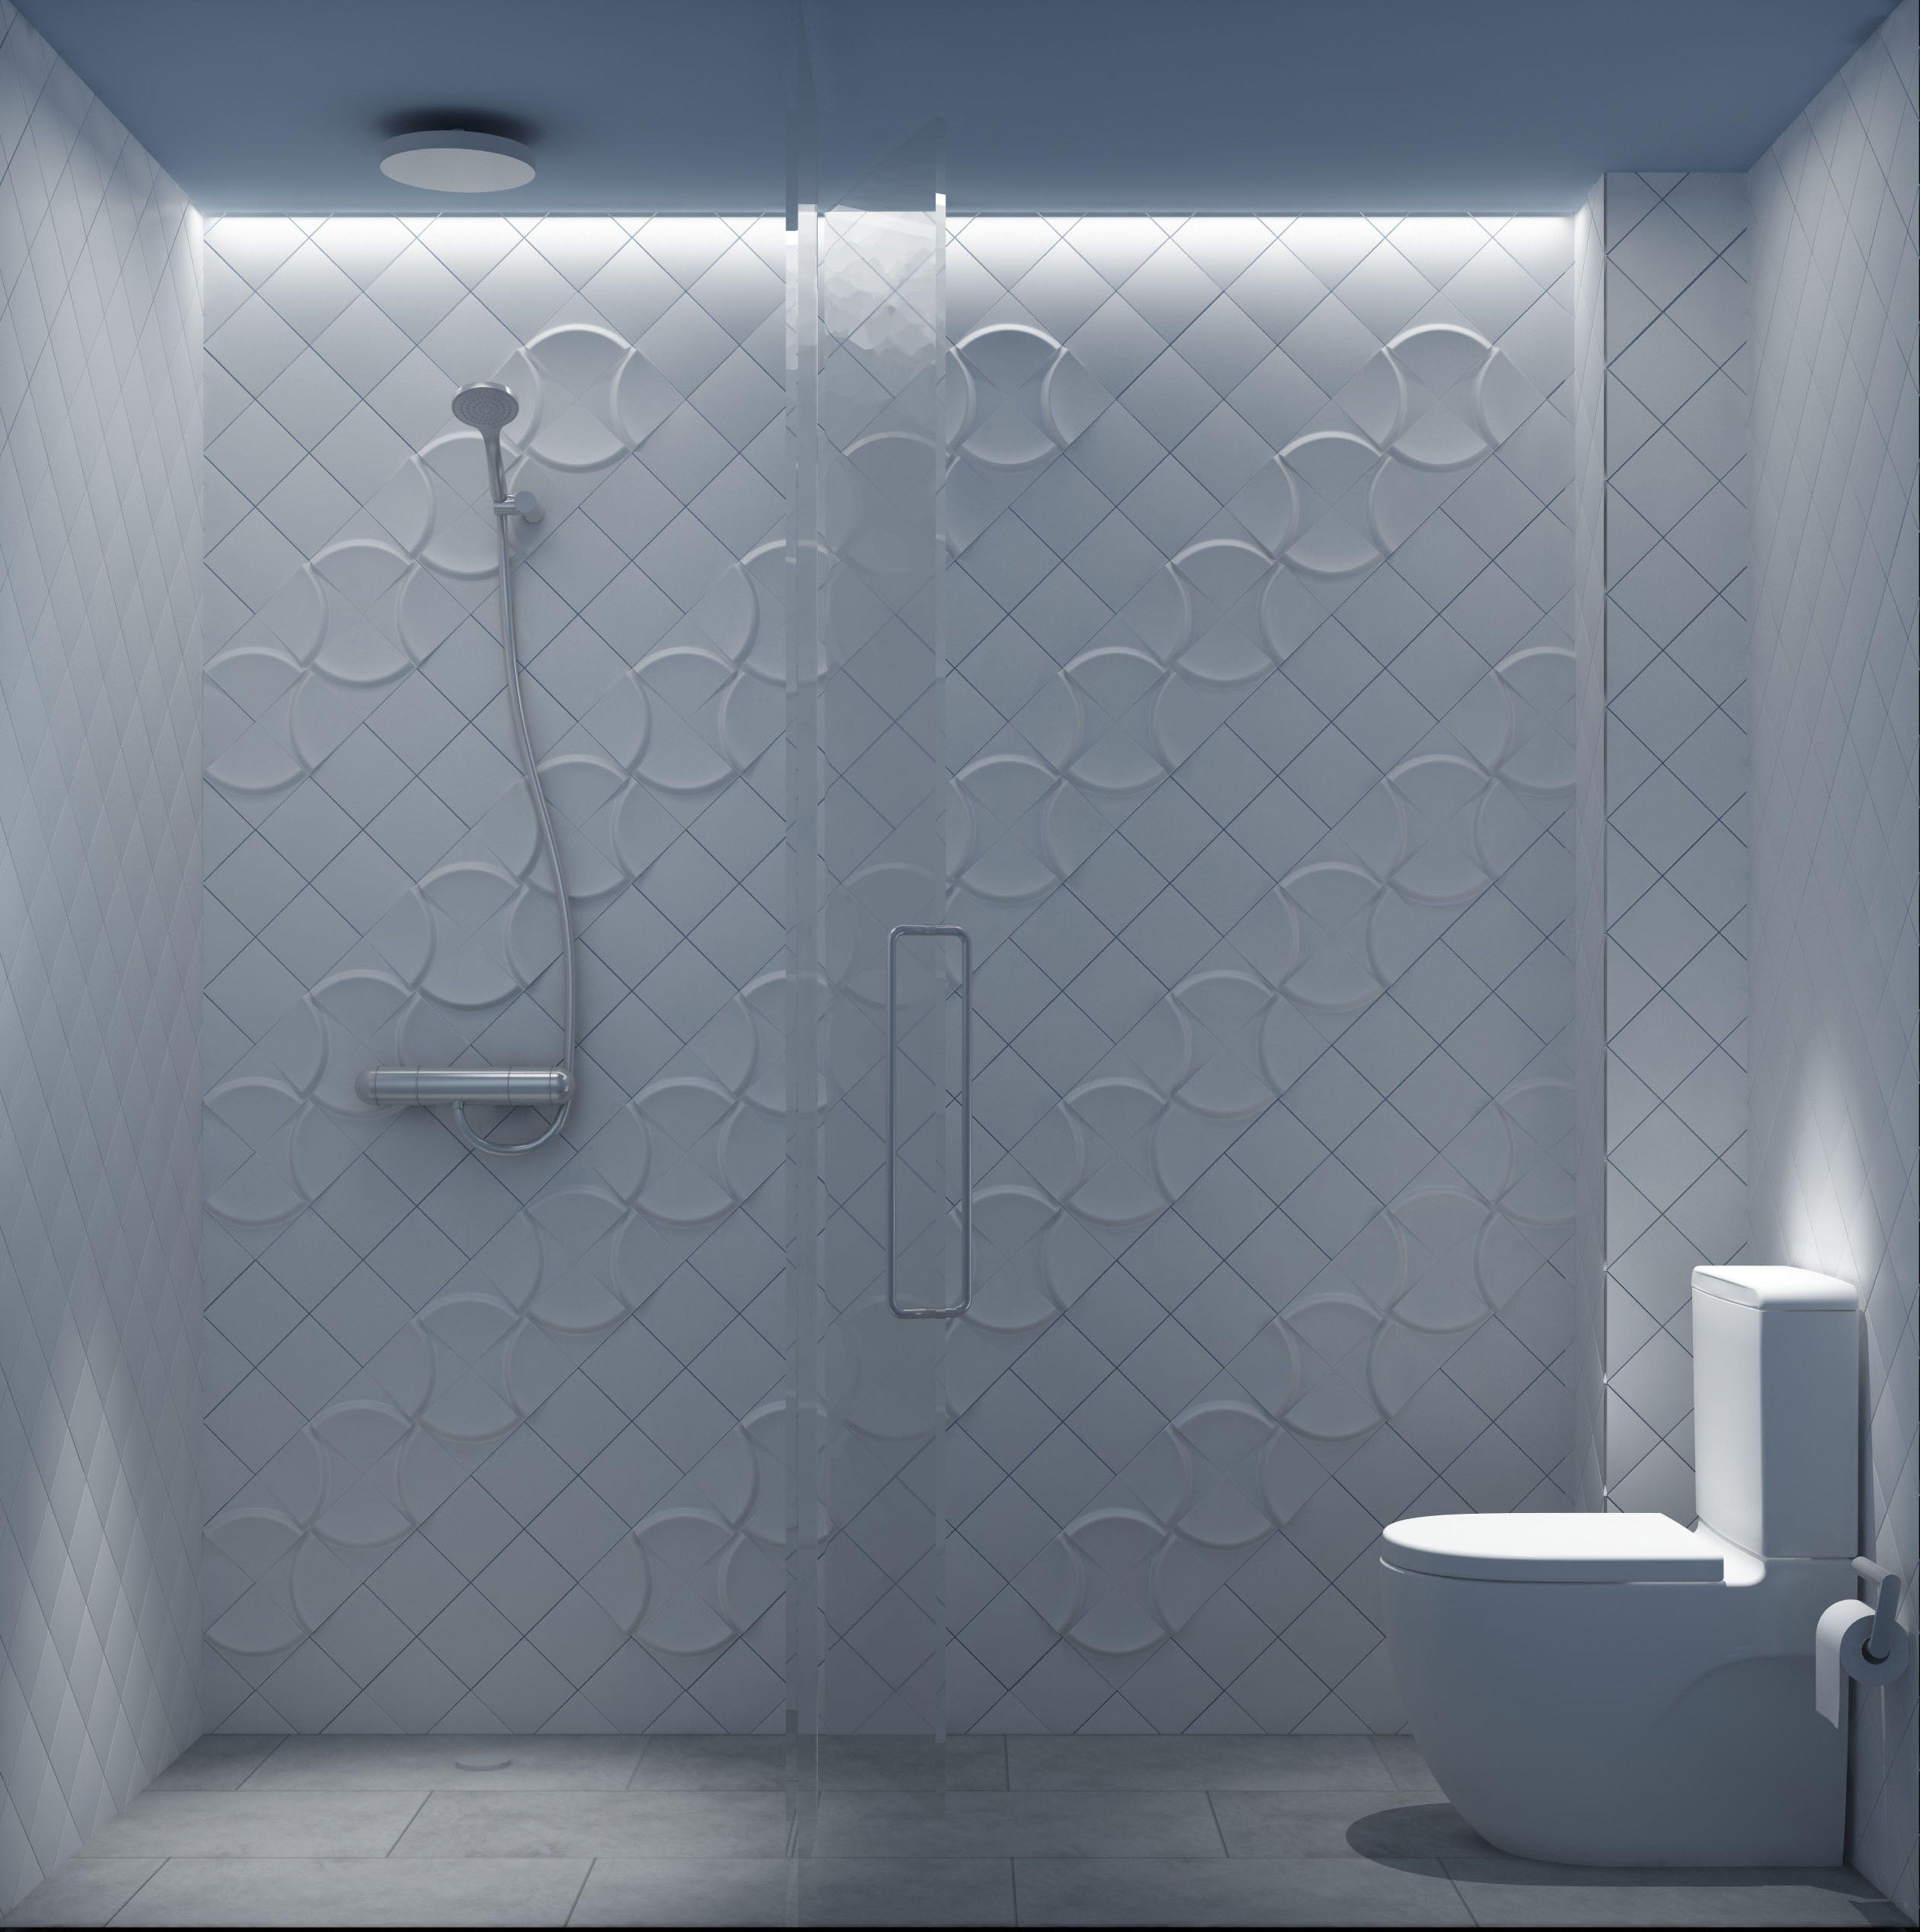 BOWL by STONE DESIGNES | HARMONY | wall tiles | 12x12 cm | Signature ...